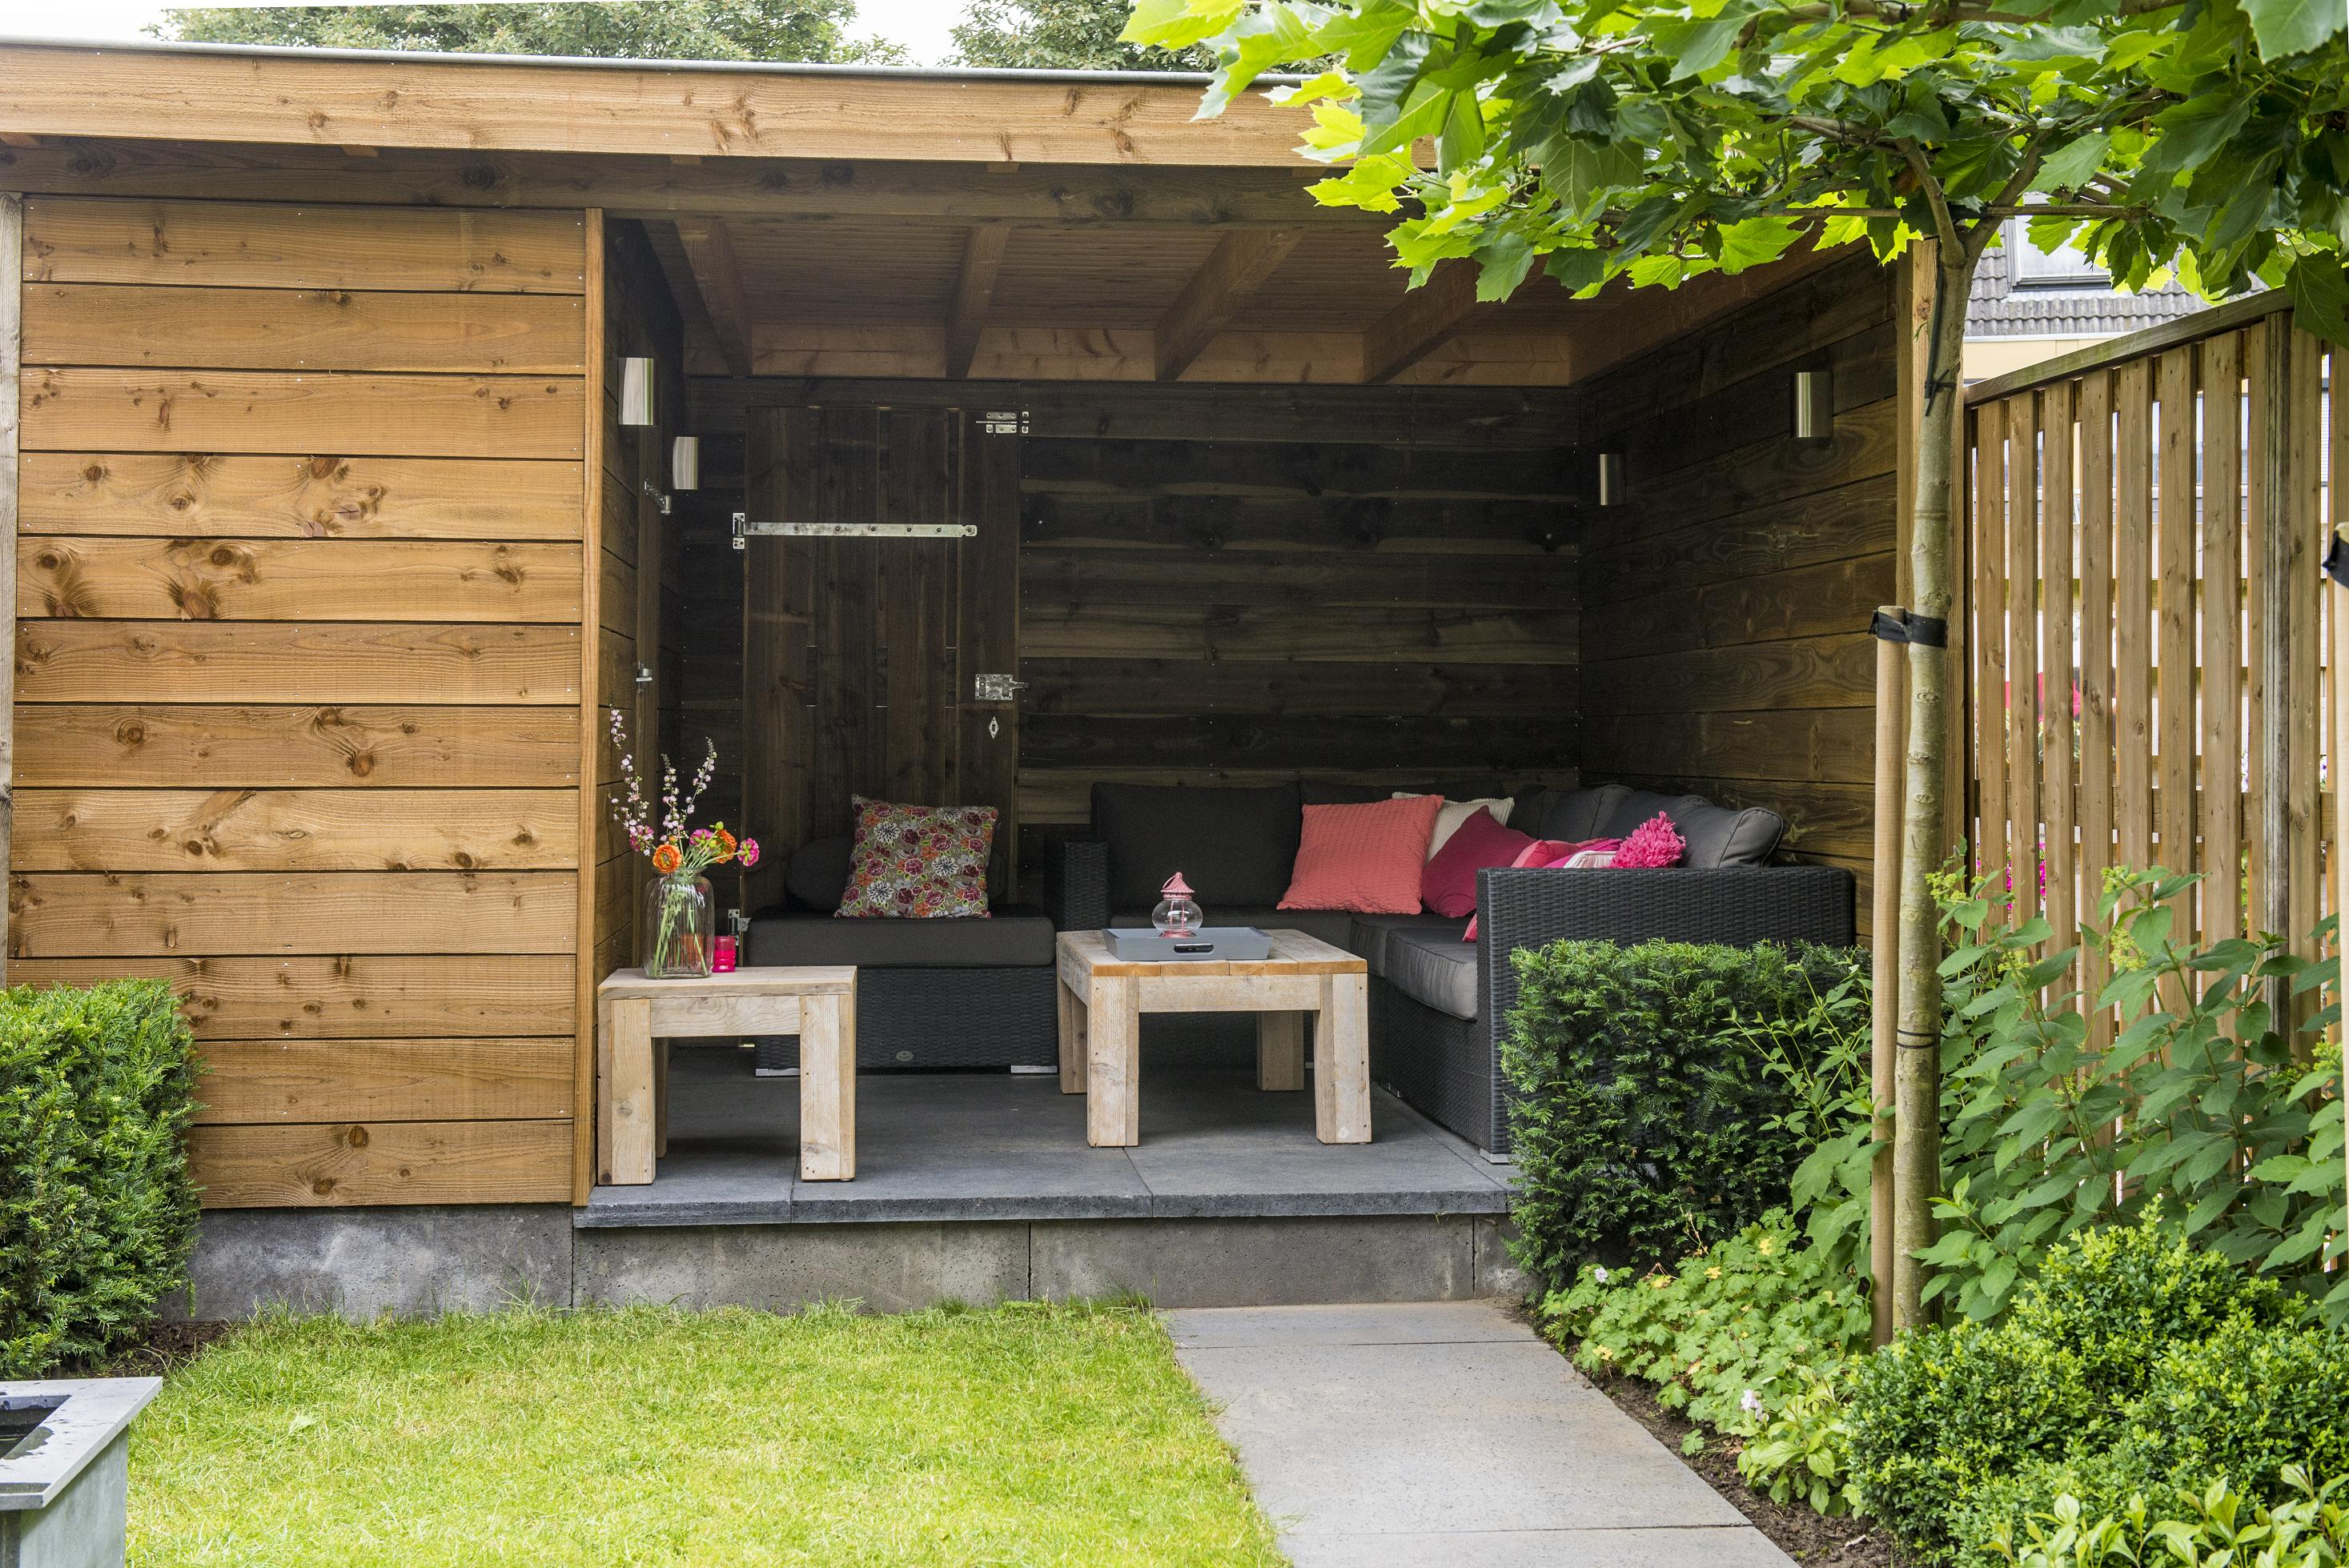 achtertuin dijkman tuinen. Black Bedroom Furniture Sets. Home Design Ideas